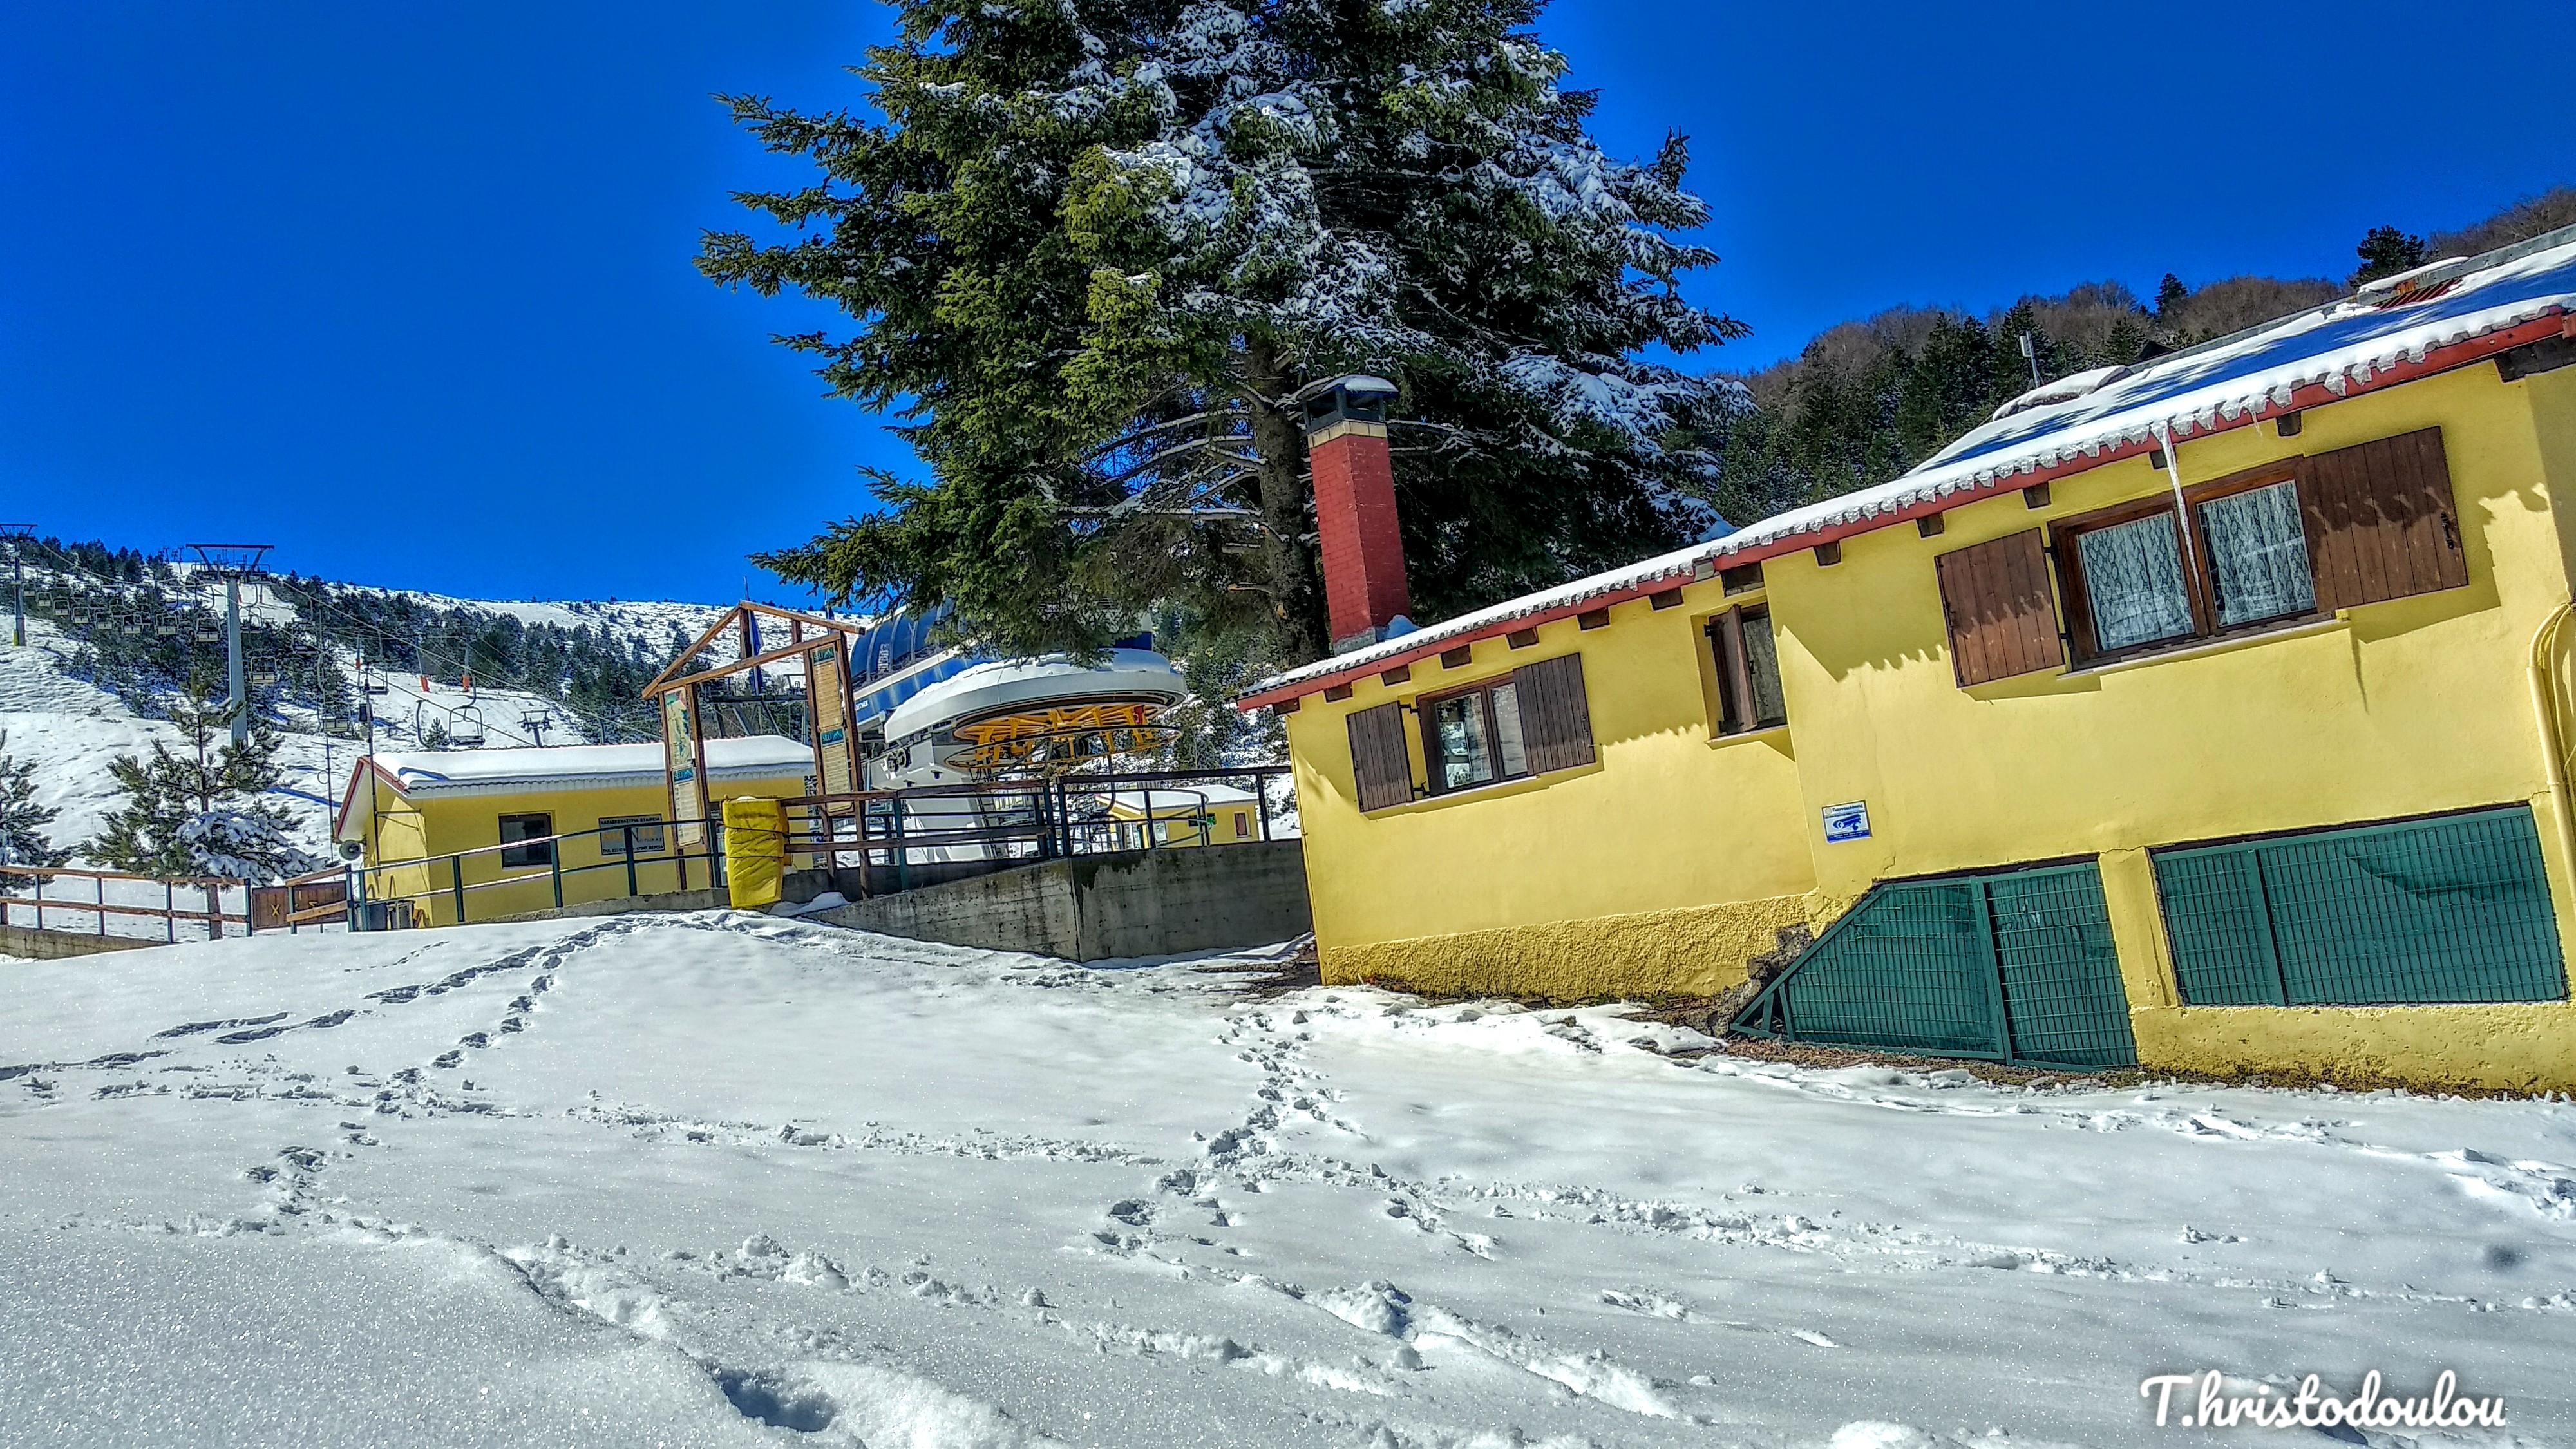 Administration of Seli ski resort